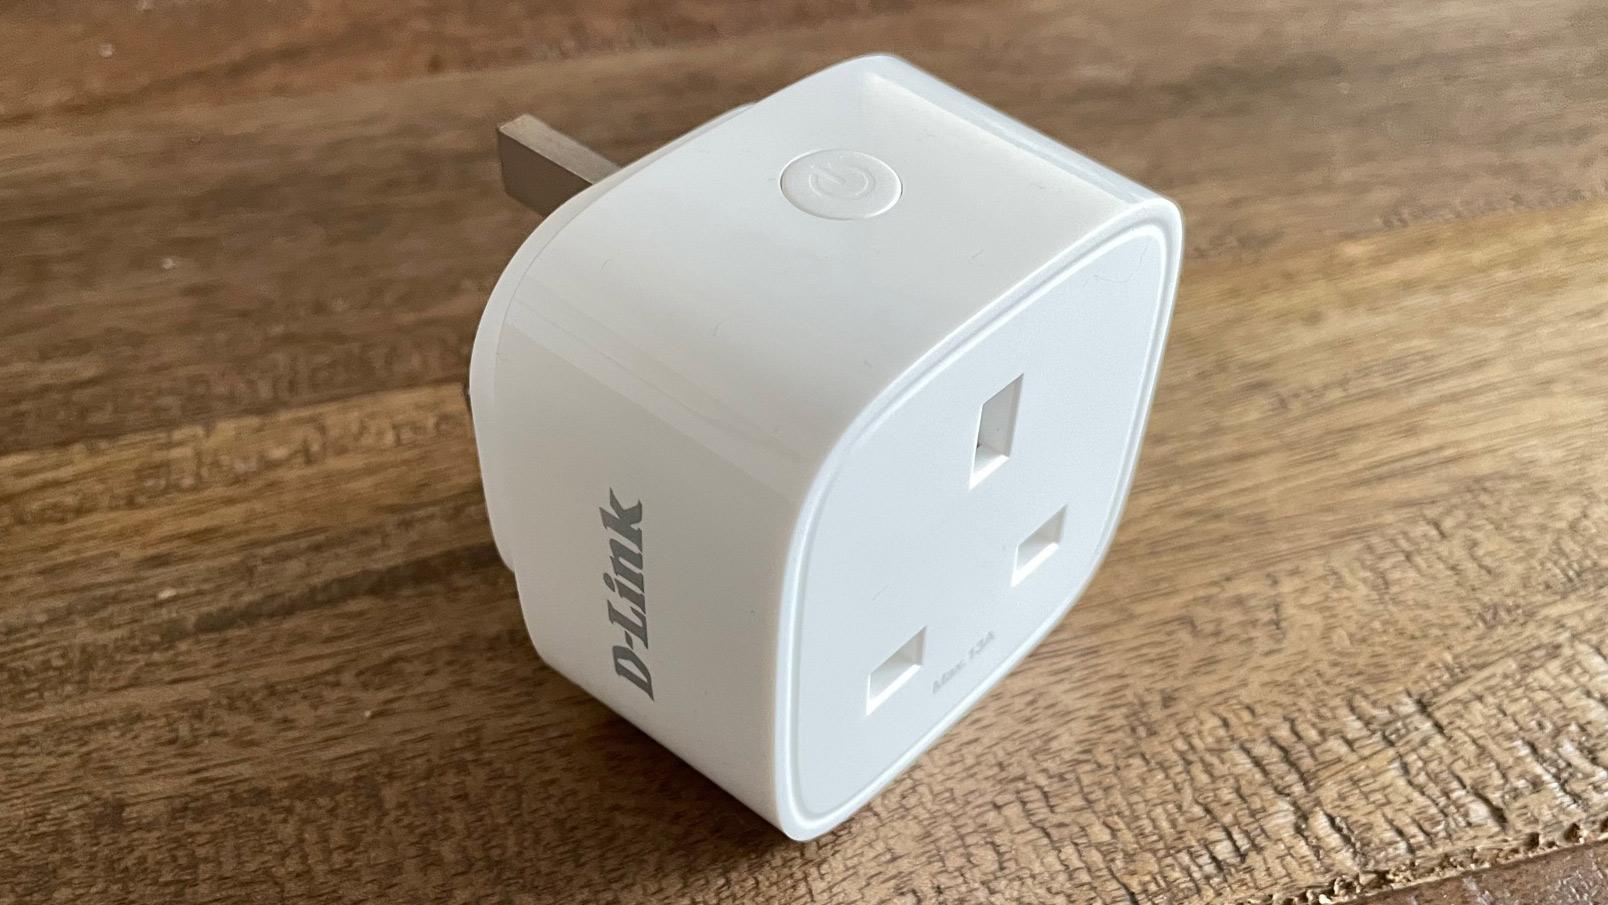 D-Link Mini Wi-Fi Smart Plug DSP-W118 on a table